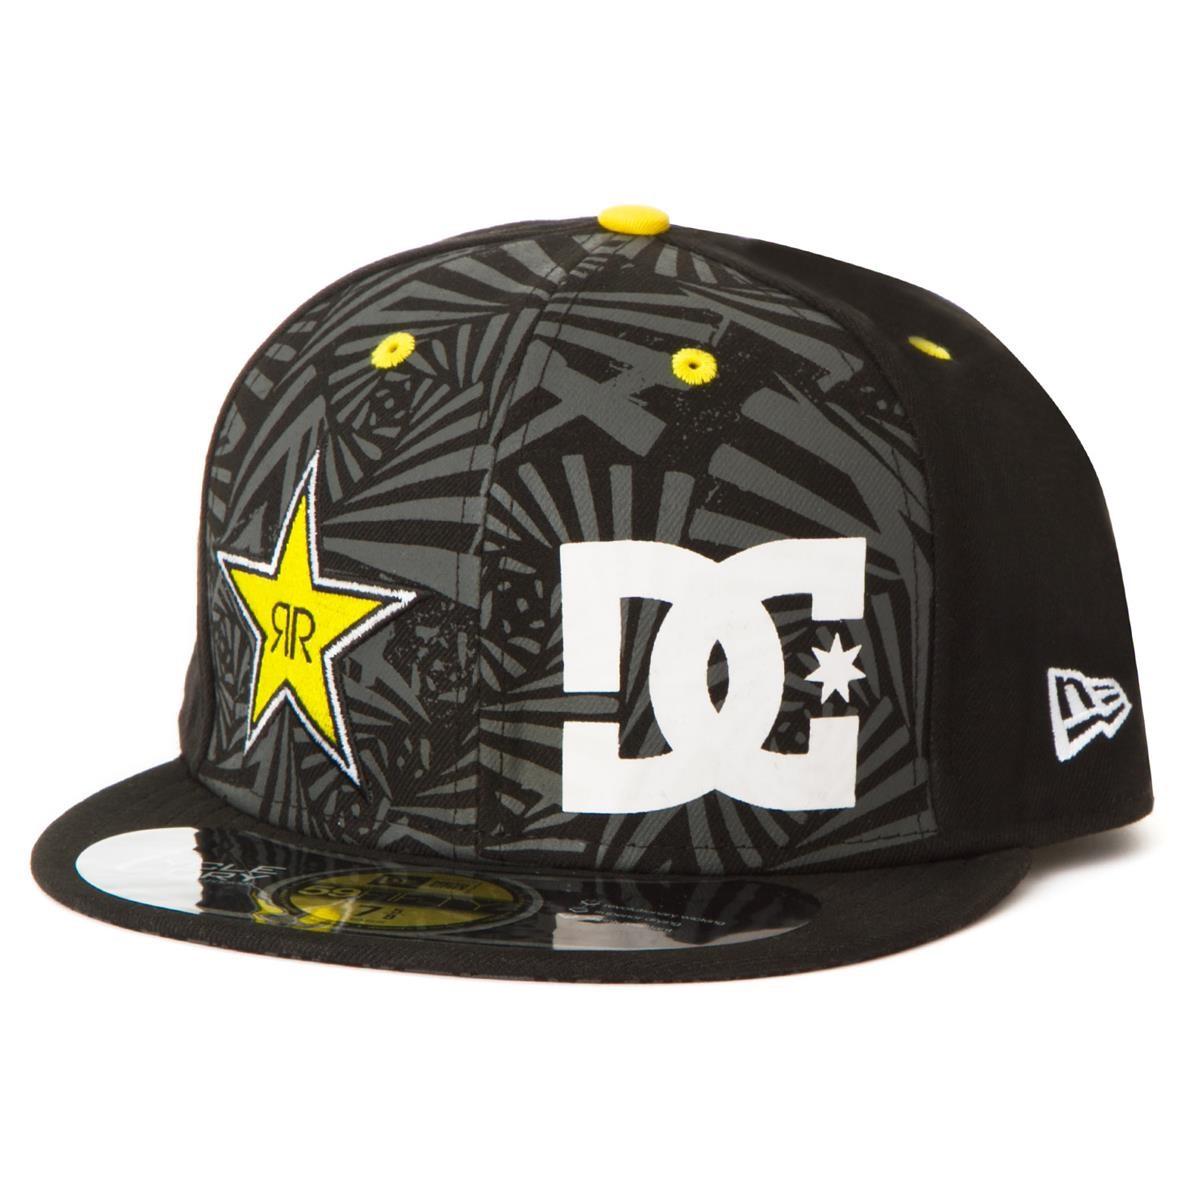 Rockstar Energy Drink Hats For Sale